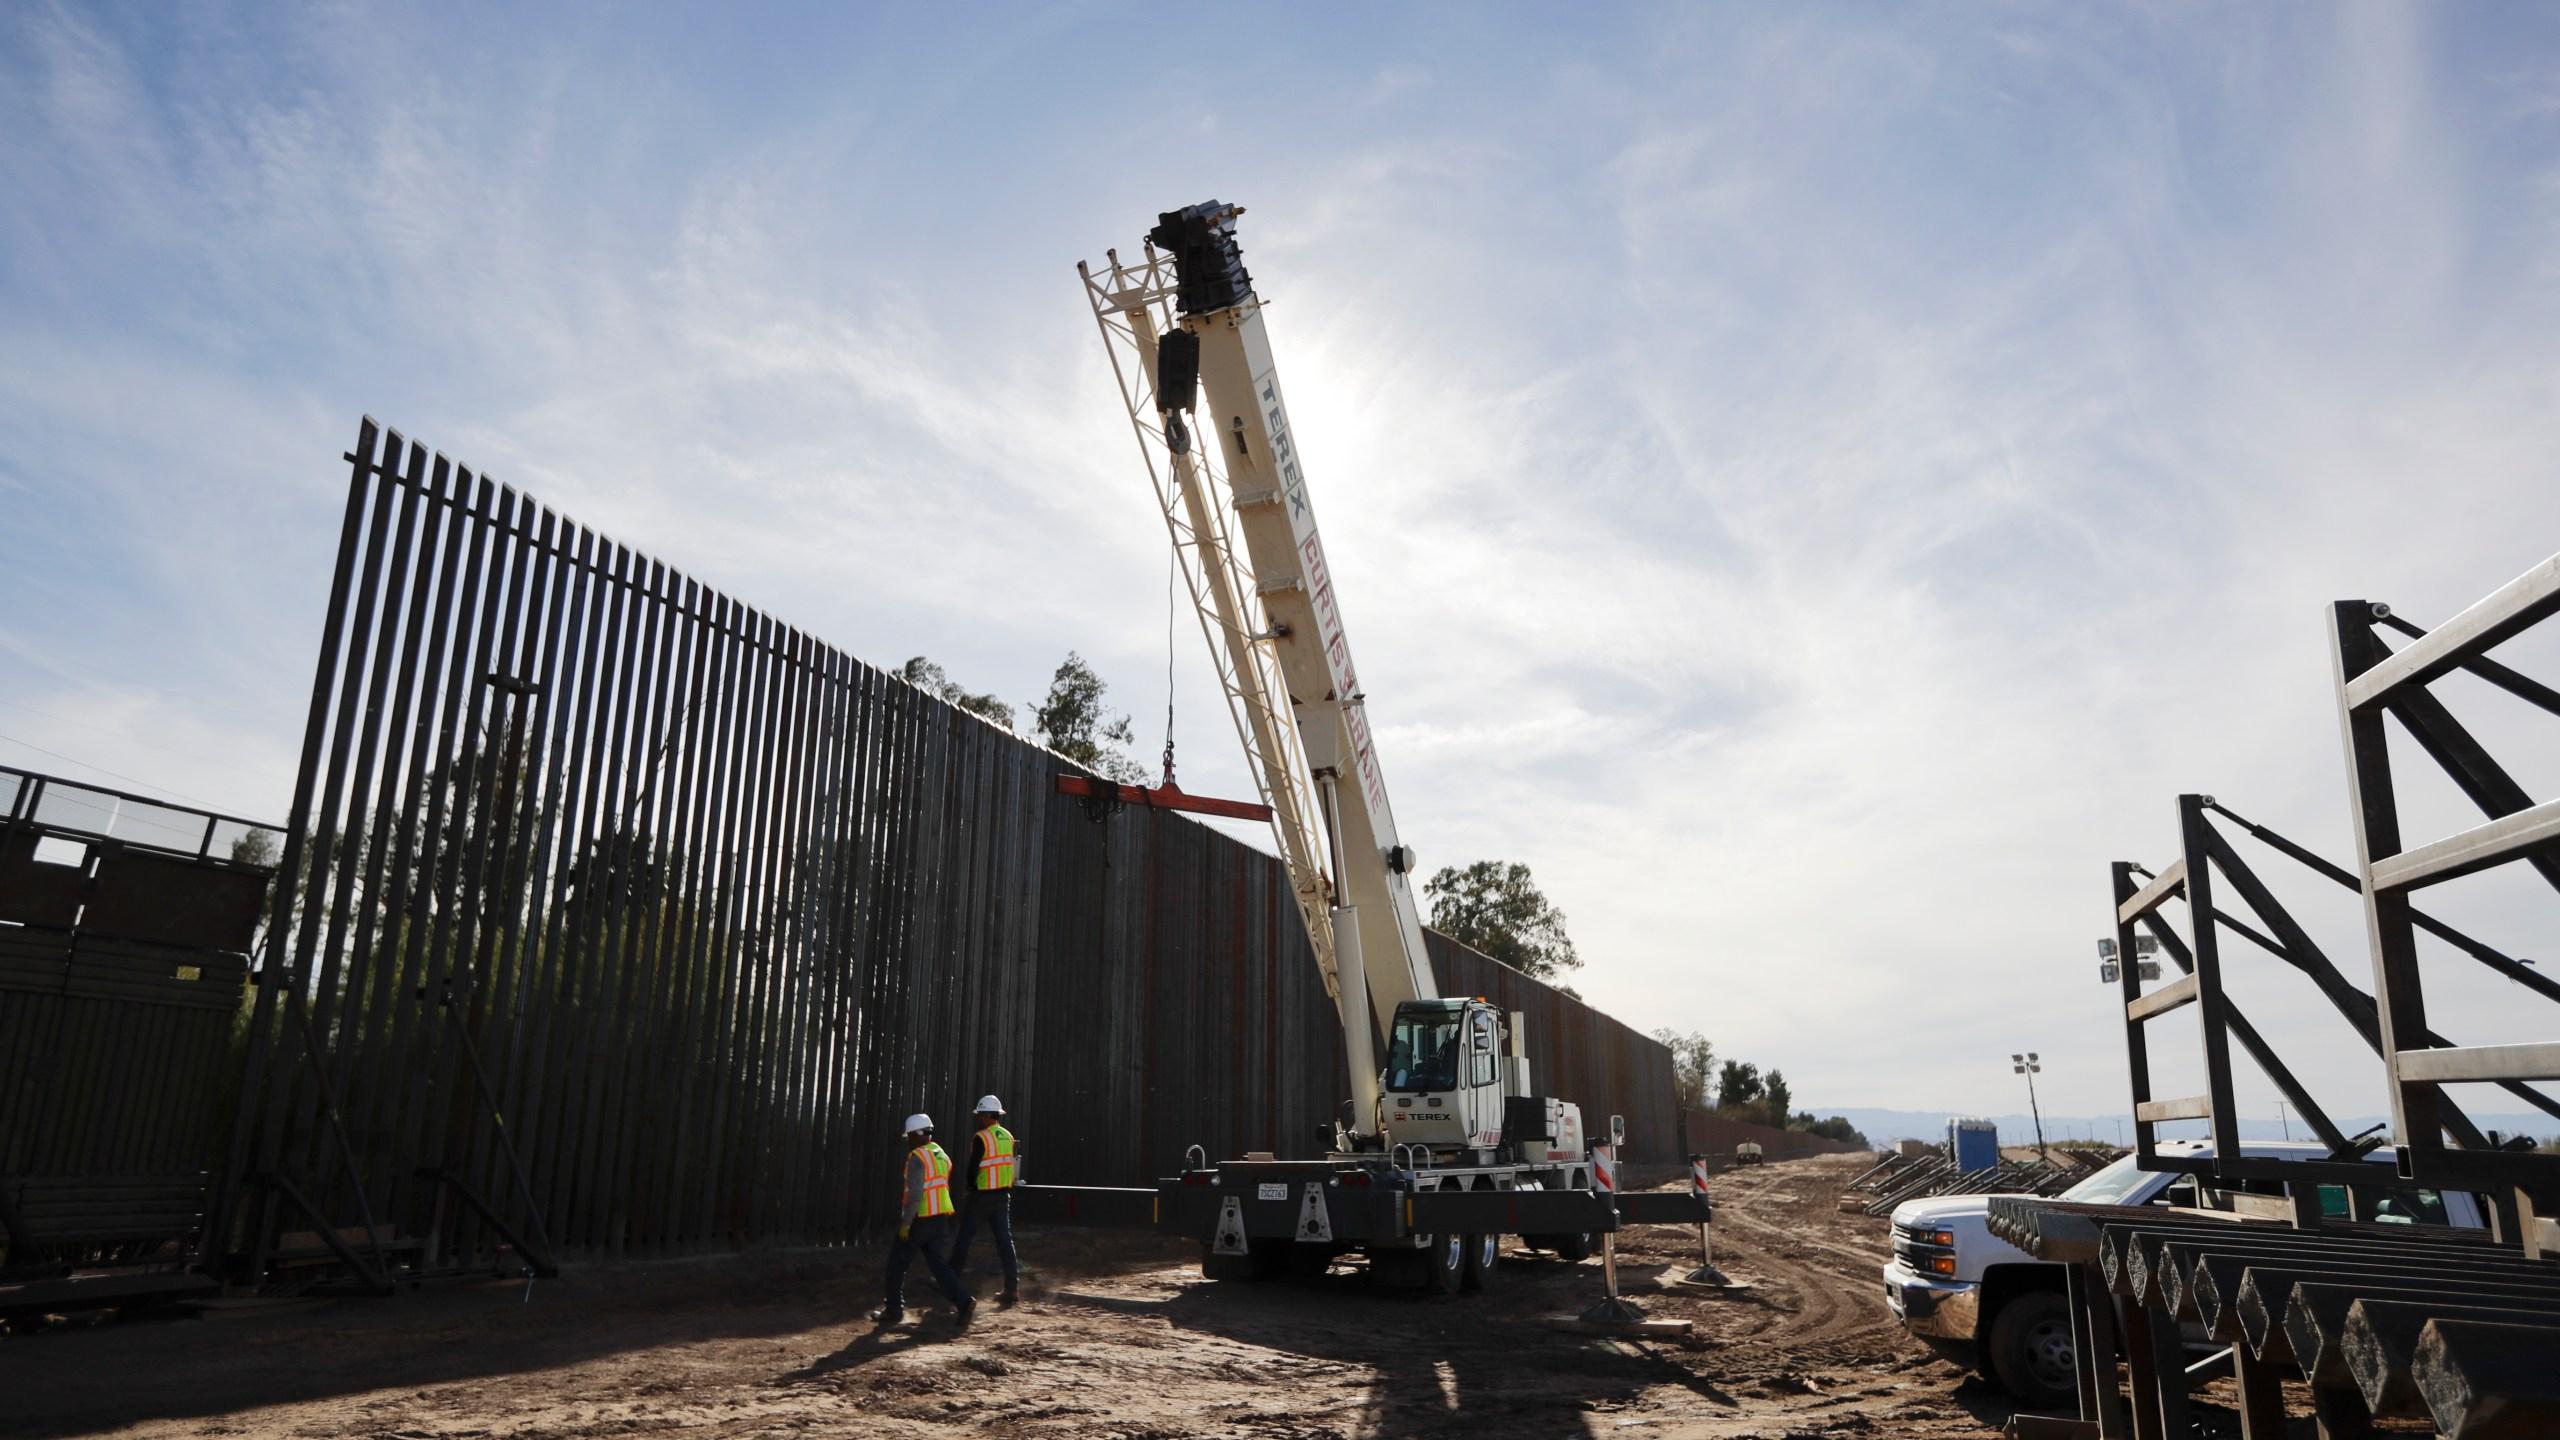 Border_Wall_News_Guide_17226-159532.jpg45621085